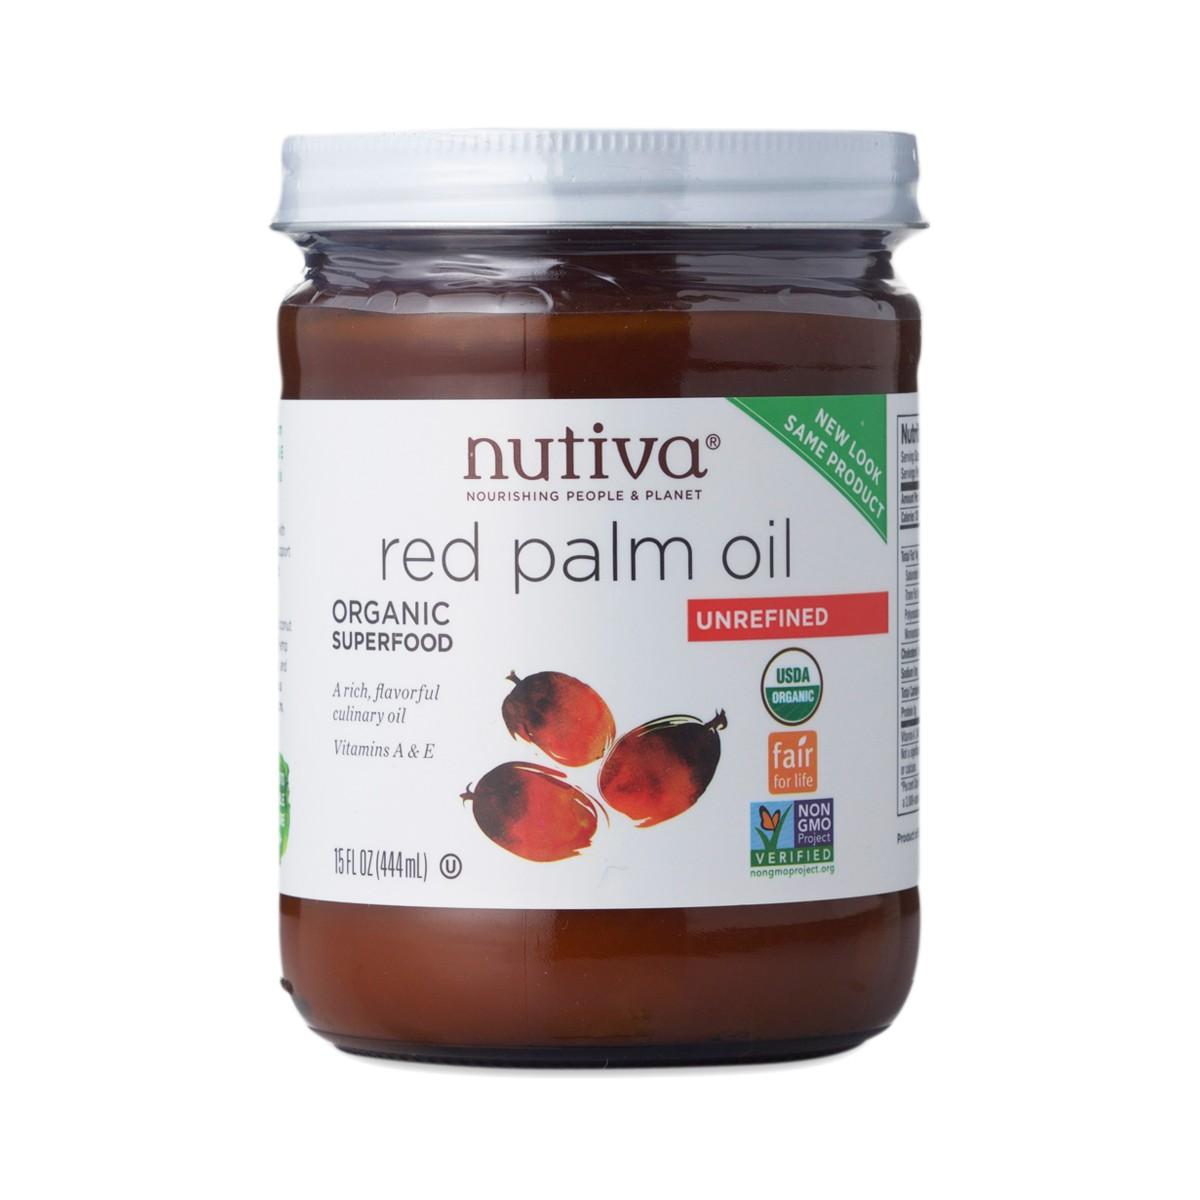 Unrefined red palm oil